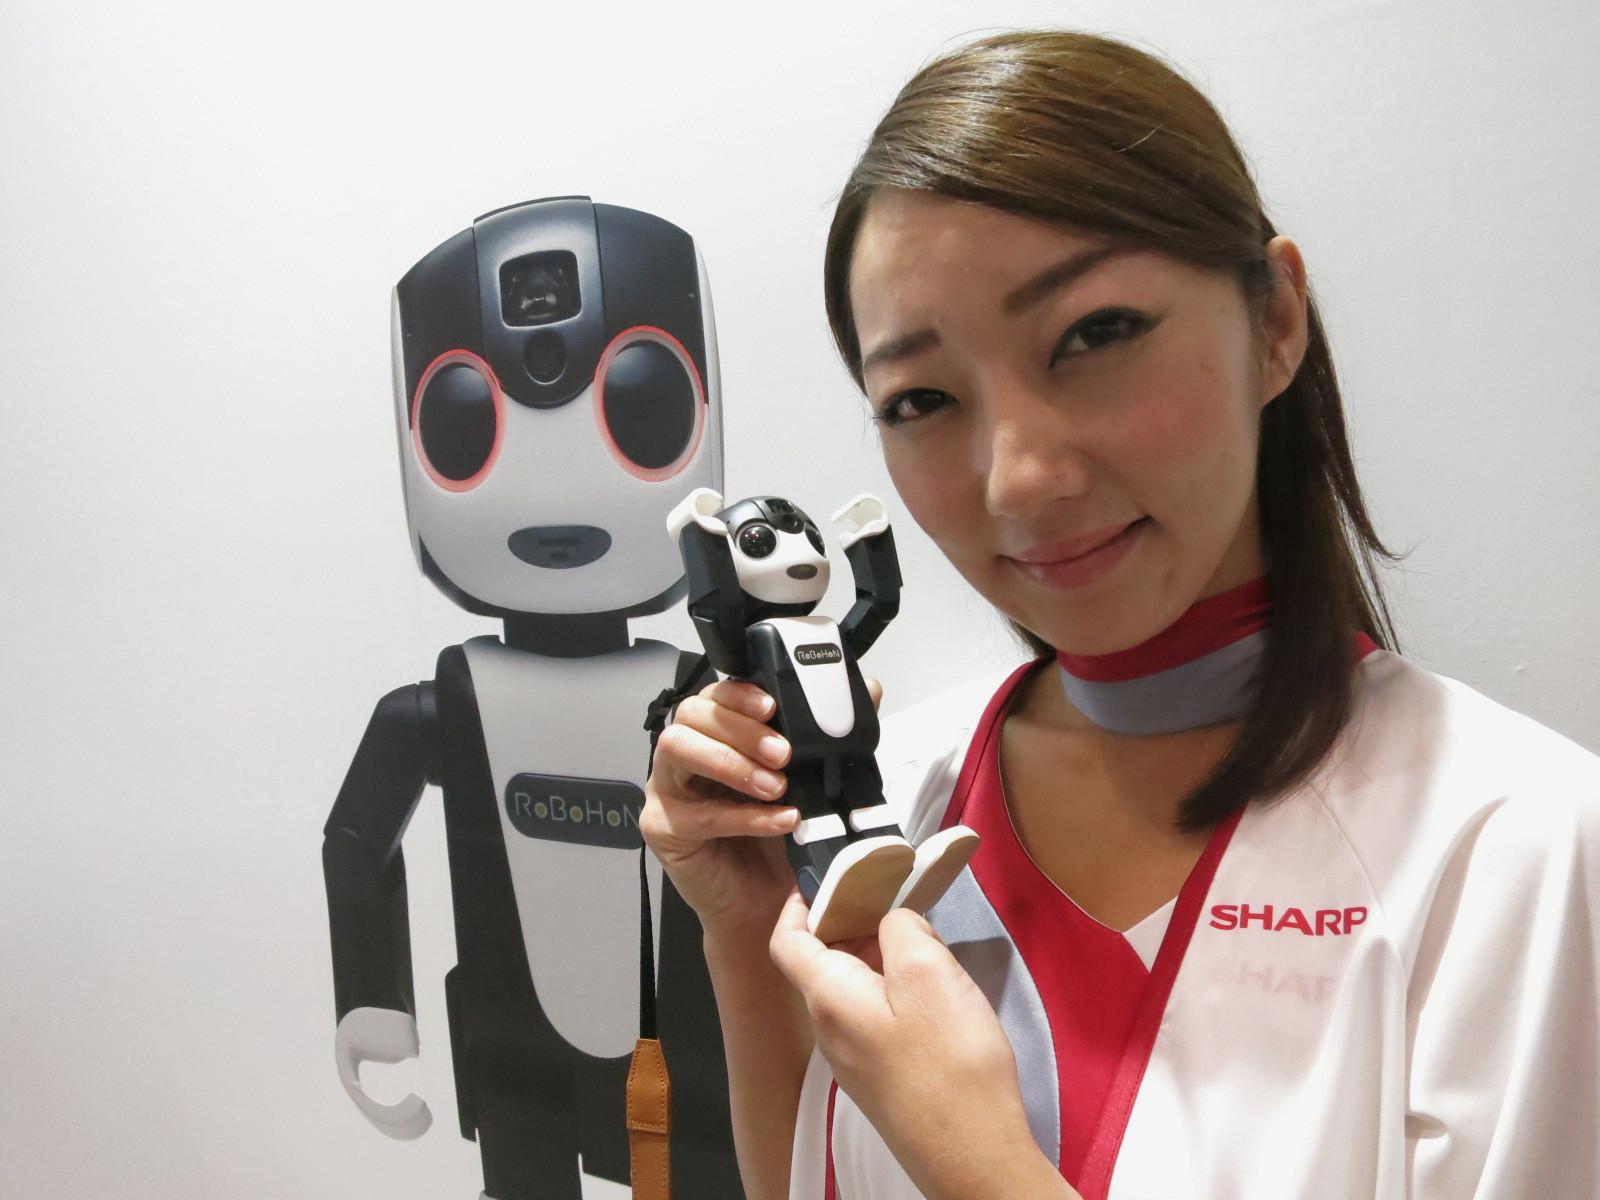 Sharp lanseaza smartphone-ul RoboHon cu aspect umanoid